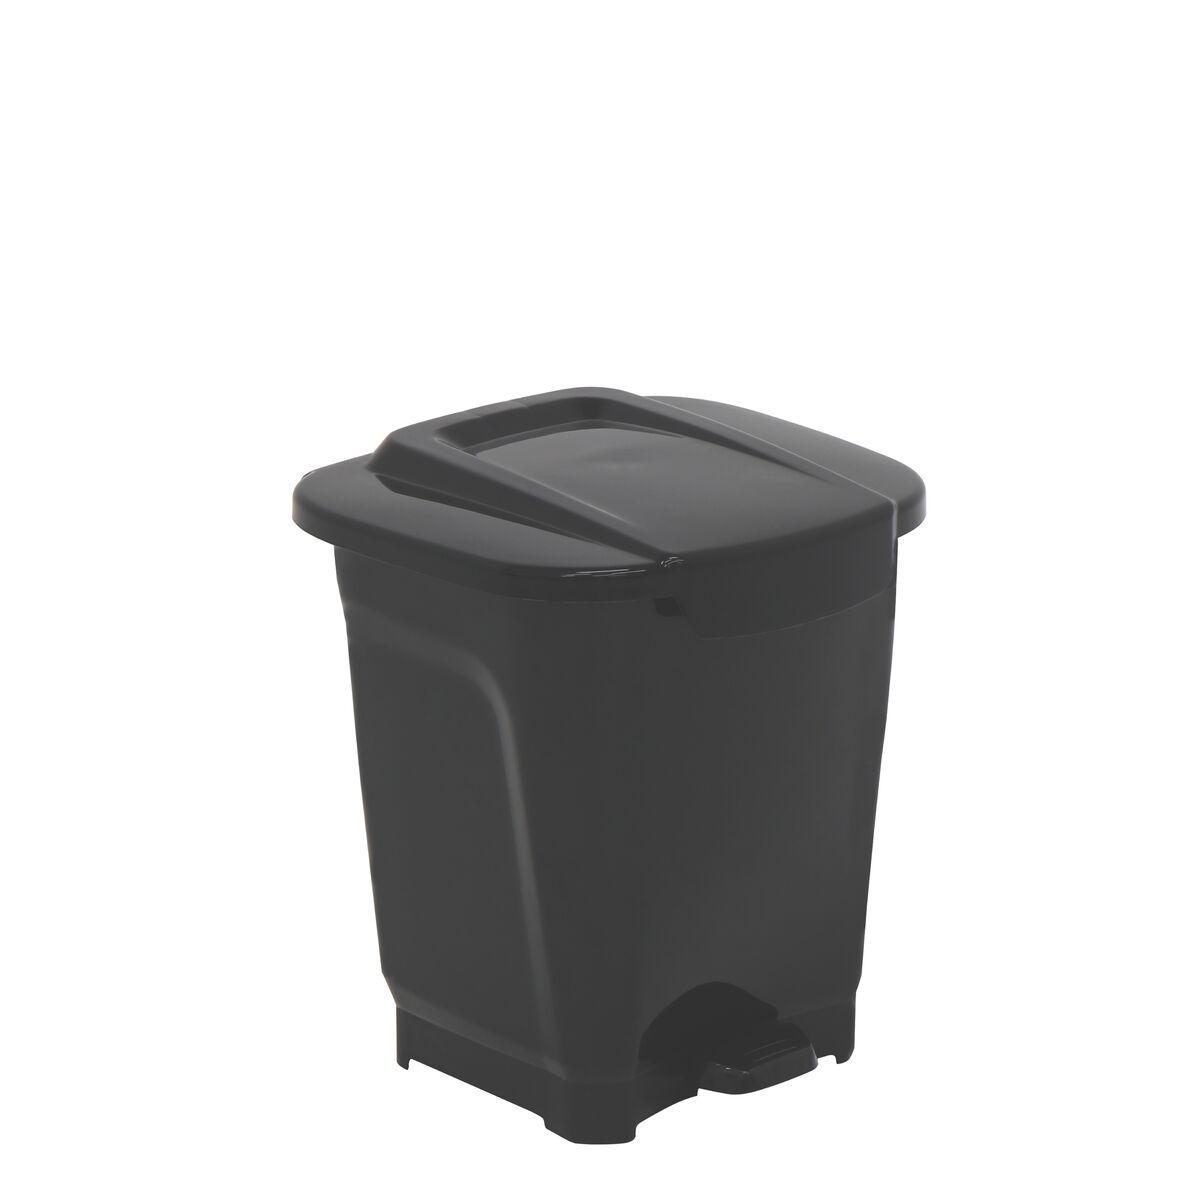 Tramontina T-Force Black Polypropylene Trash Can 15L